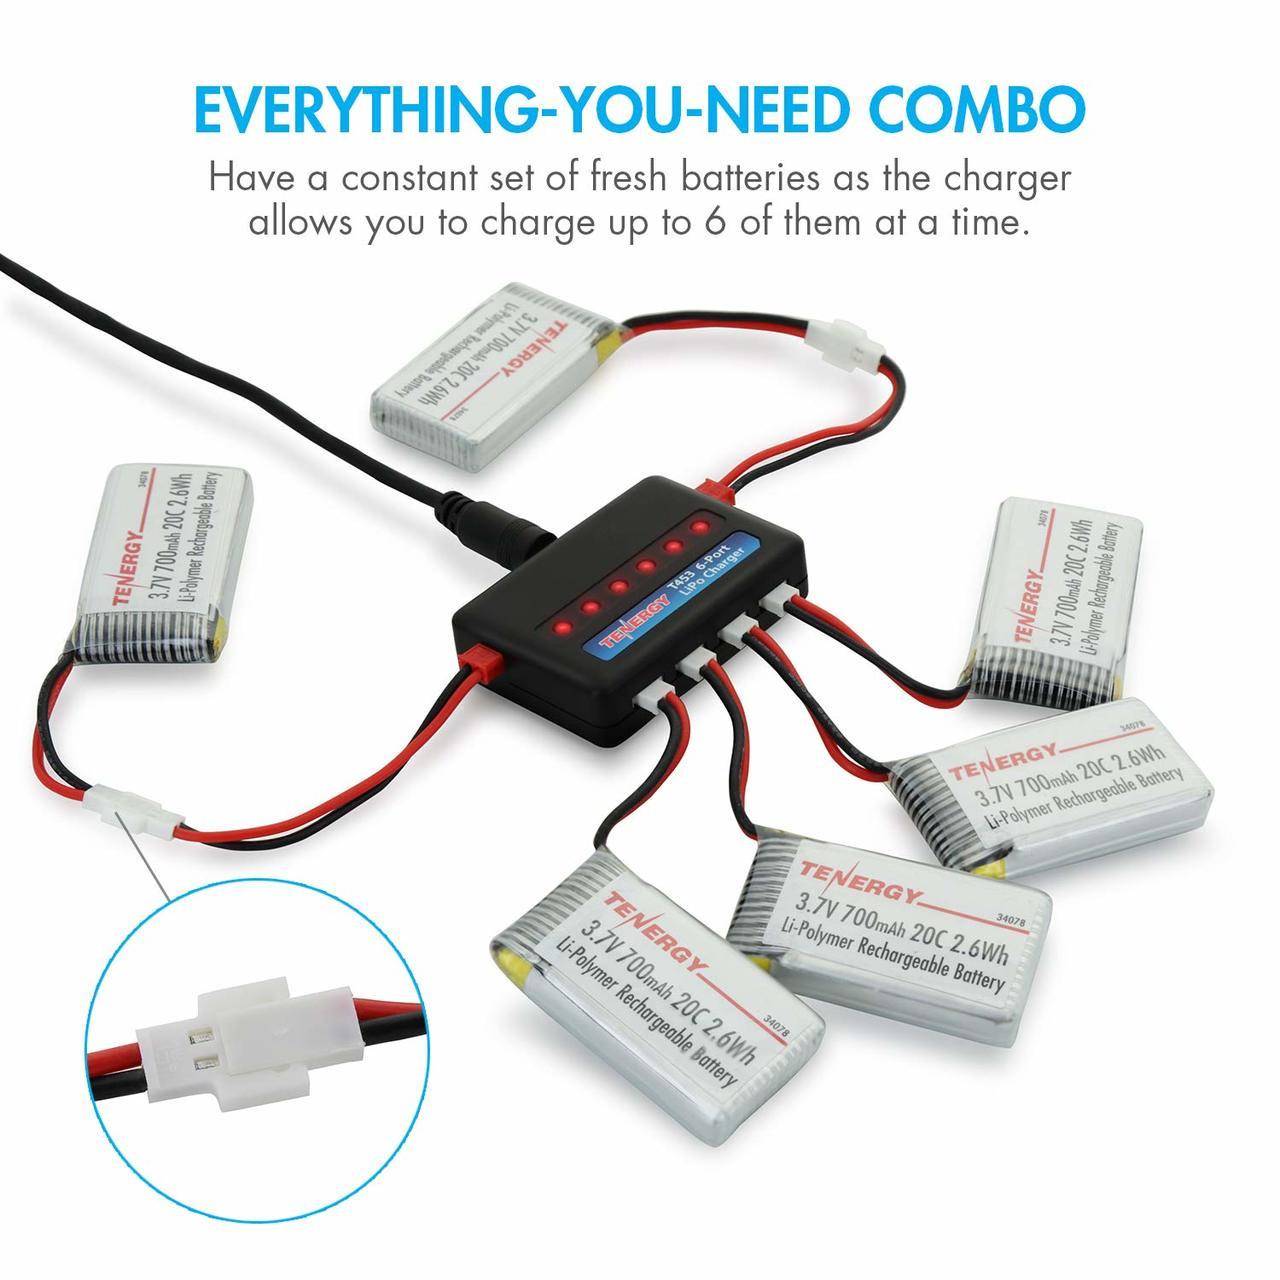 Combo: T453 charger for 3.7V Lithium RC battery + 6pc 3.7V 700mAh LiPo Battery Packs